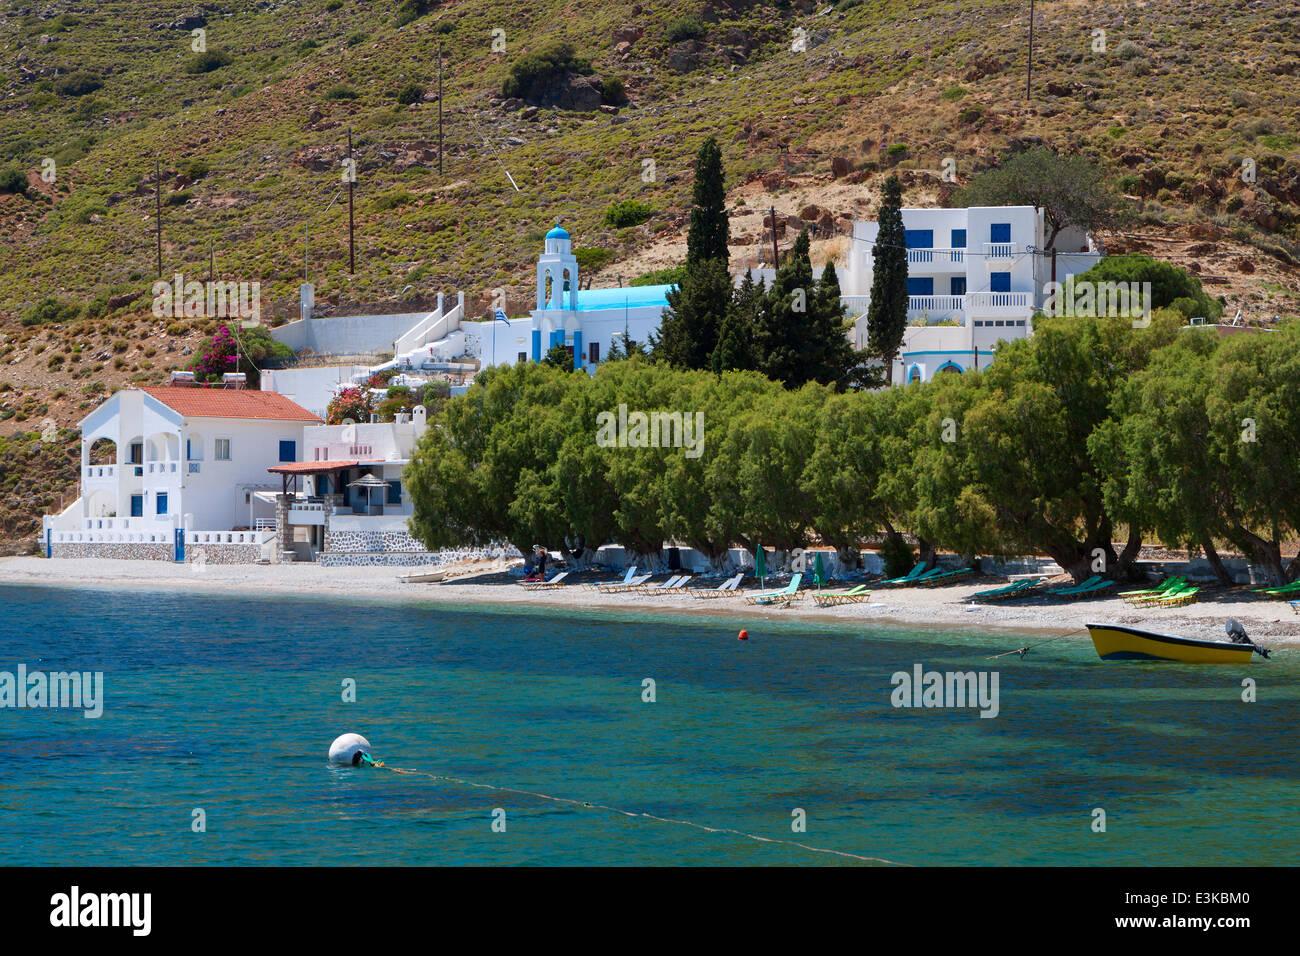 Emborios bay at Kalymnos island in Greece - Stock Image